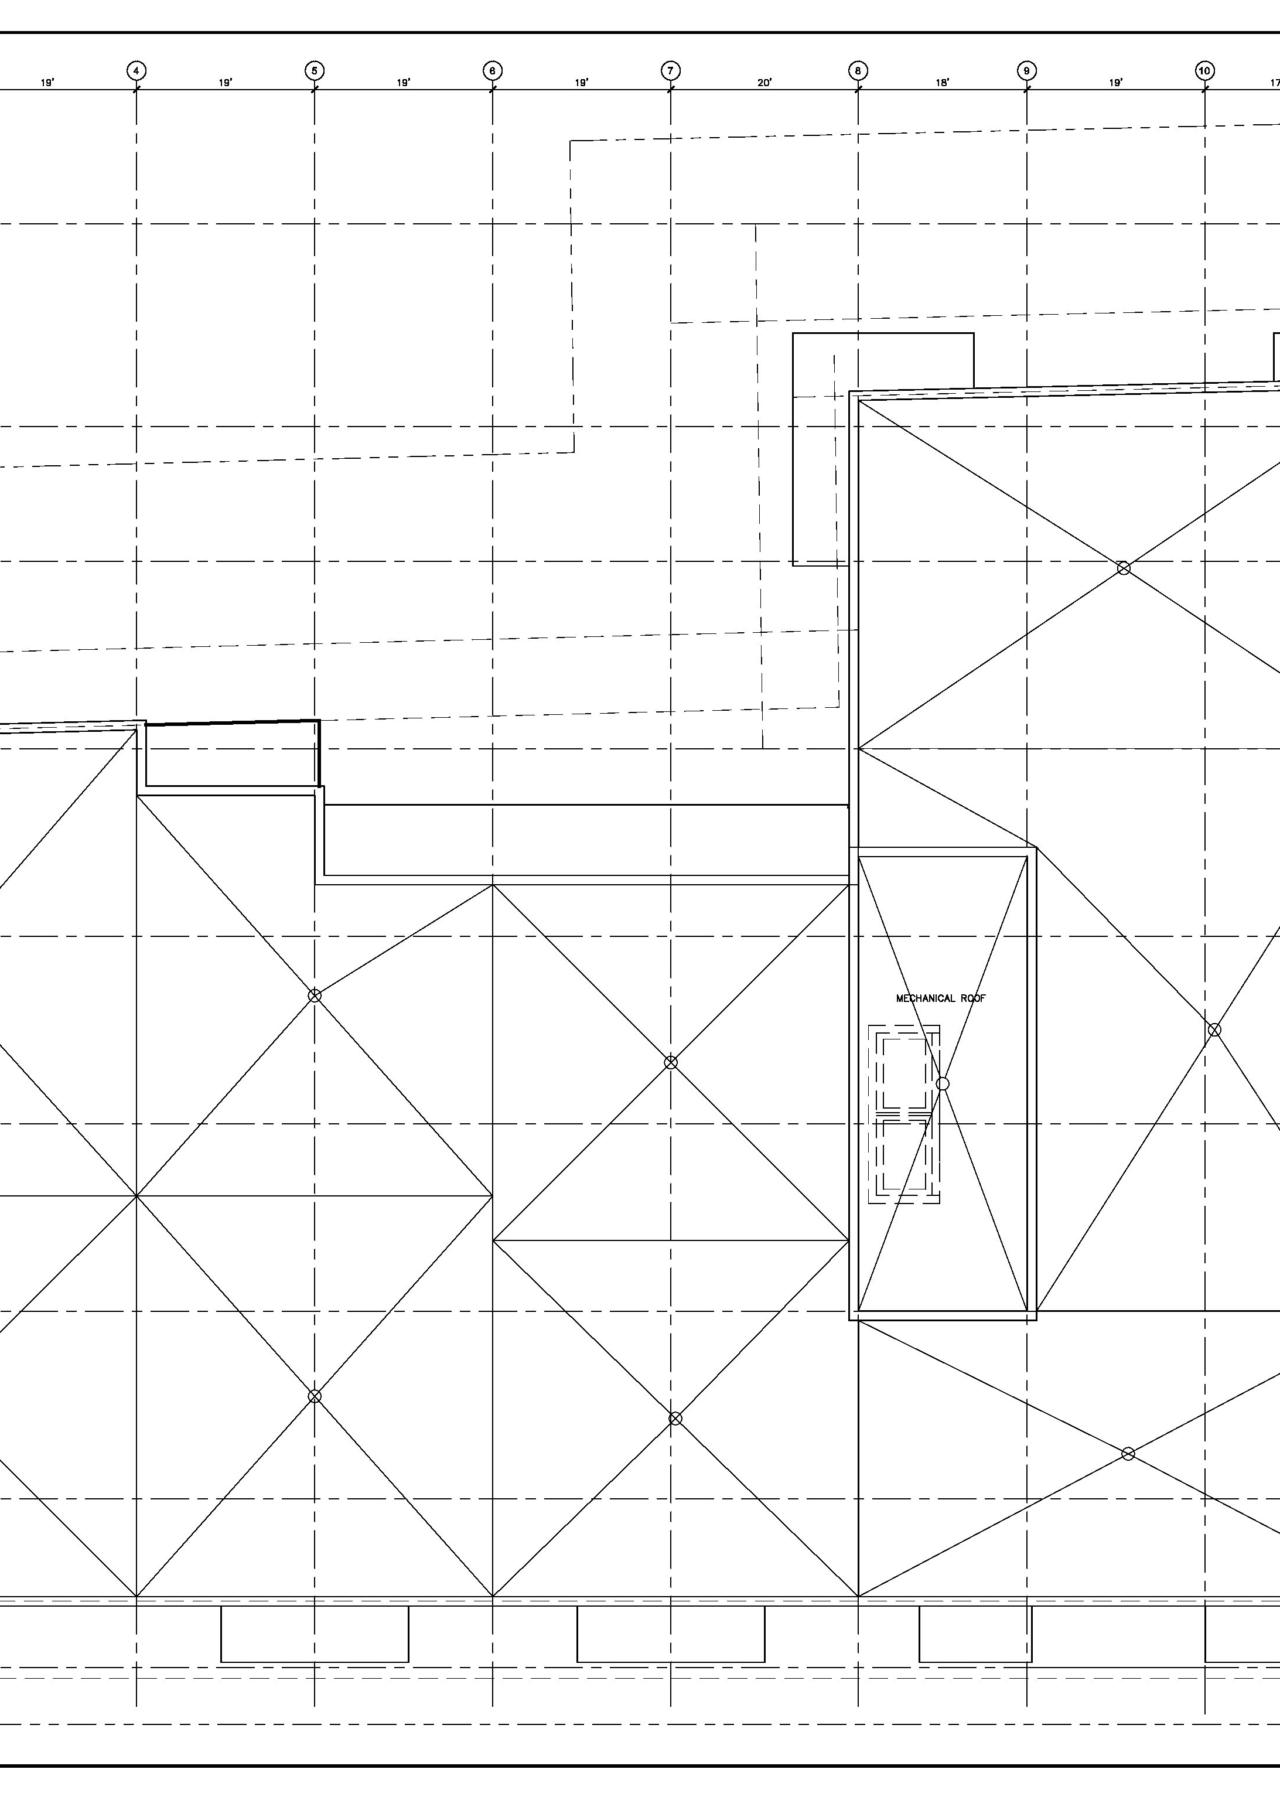 3093 A3 Floor Plan-A3.5